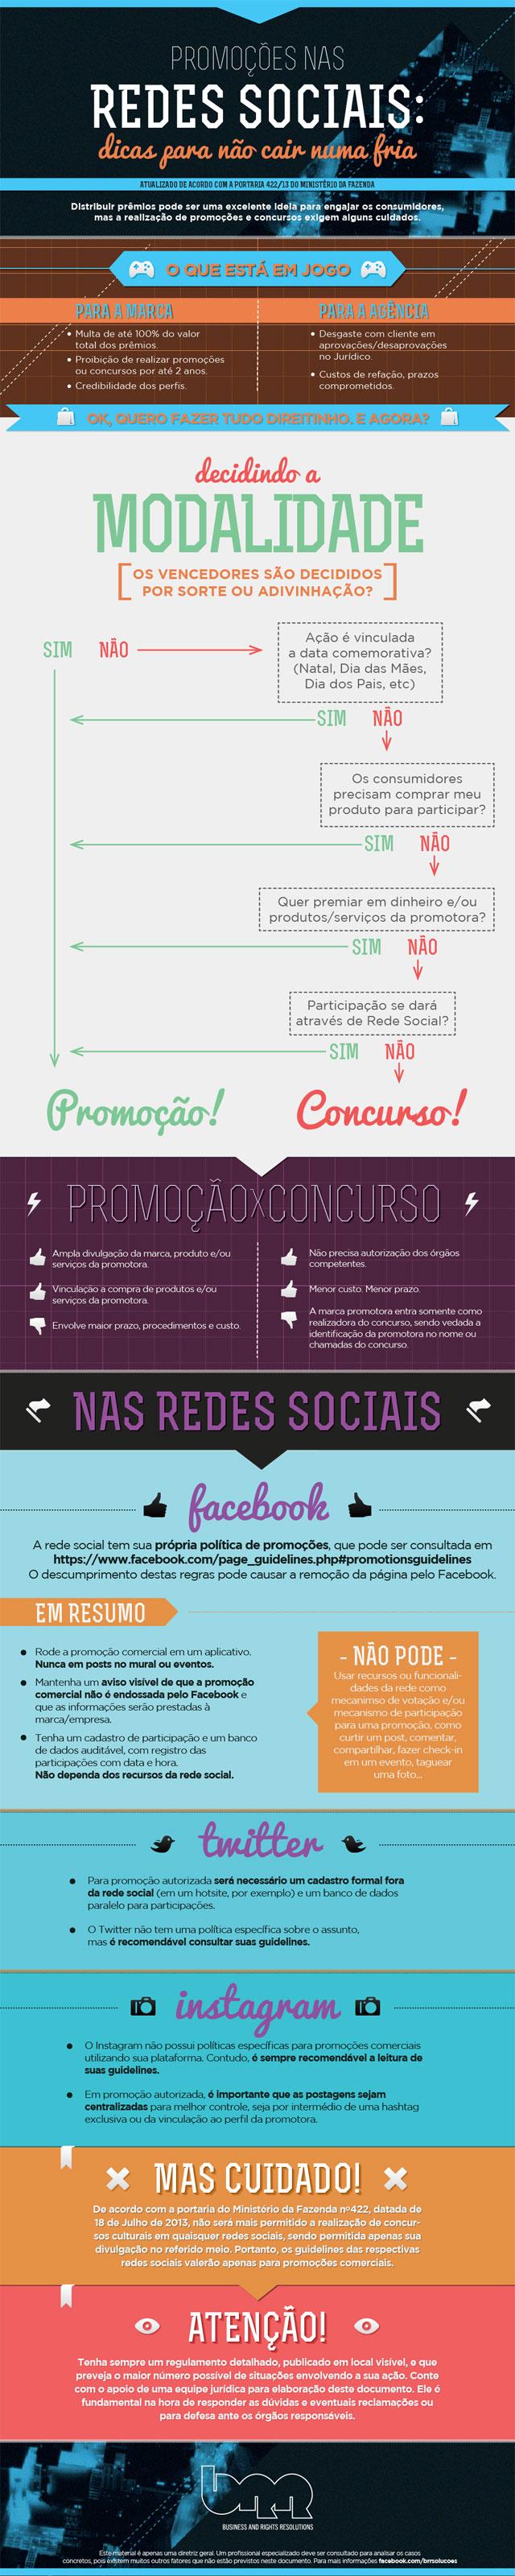 infografico-concurso-cultural-promocoes-redes-sociais